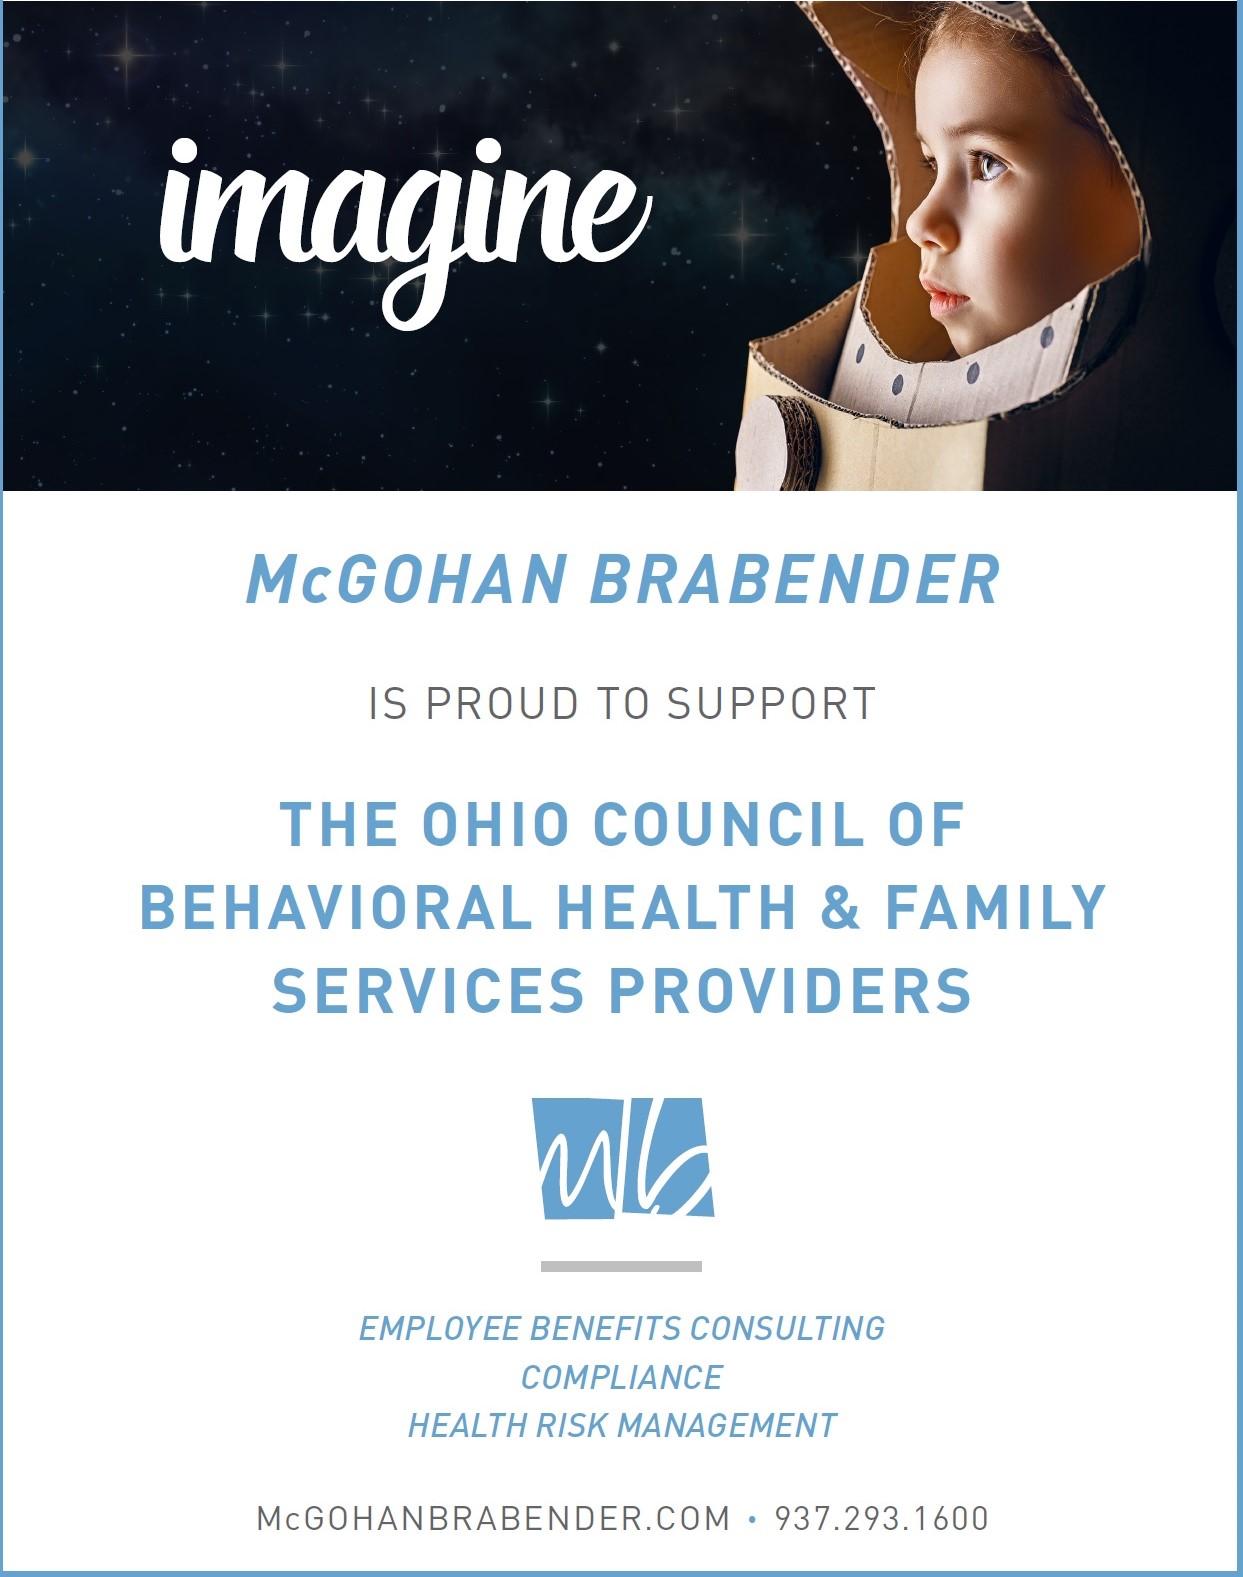 McGohan Brabender